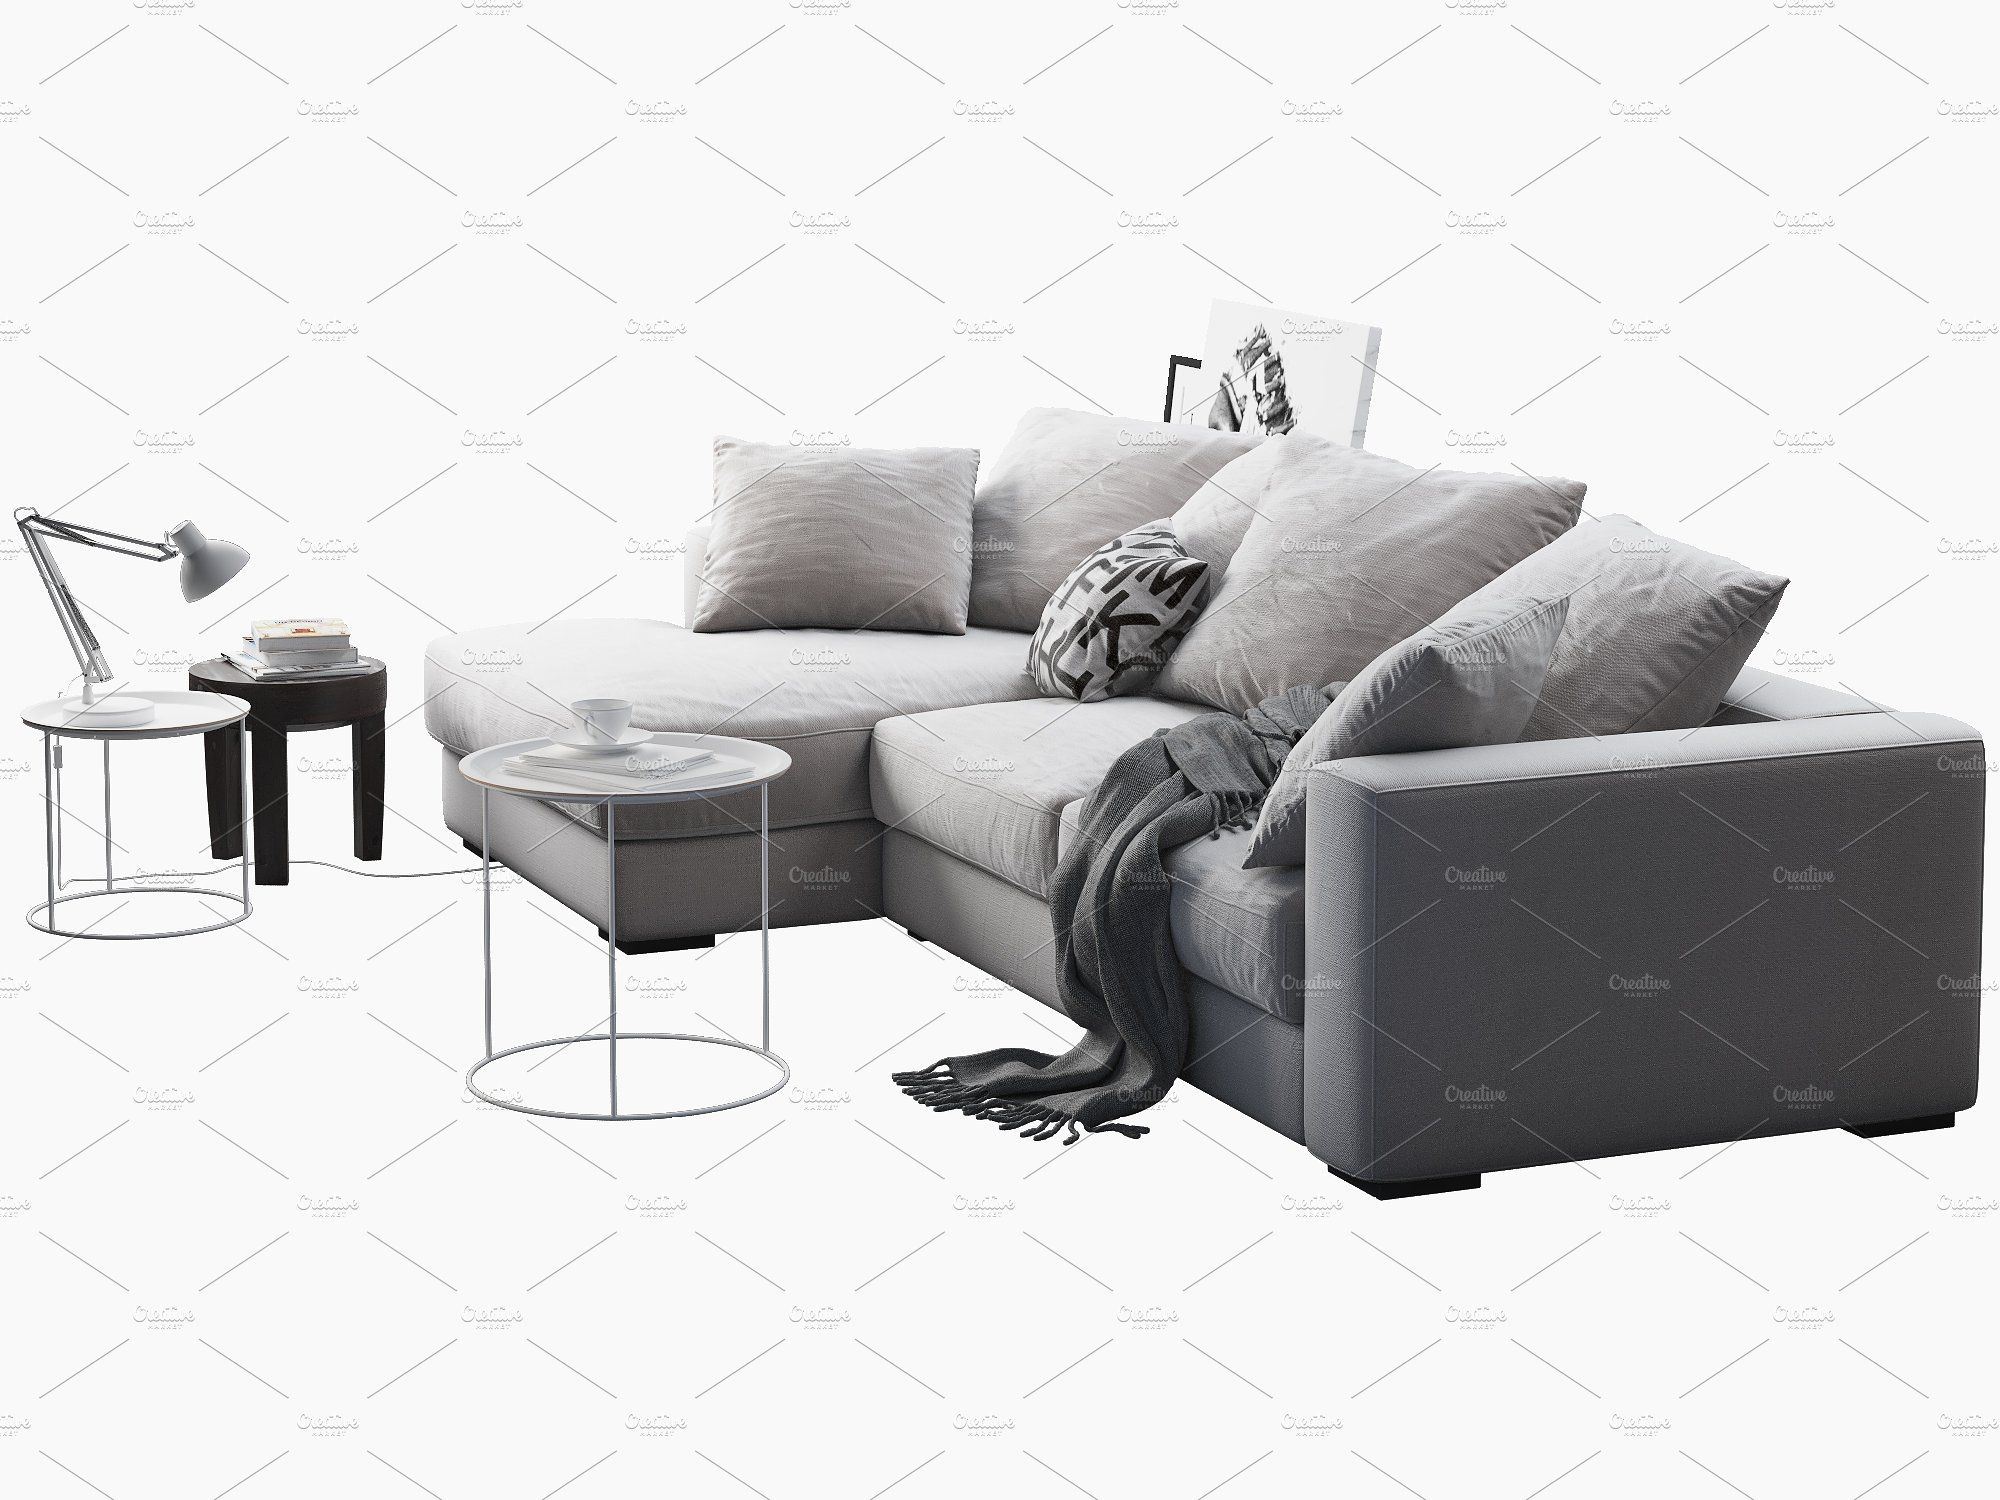 Cenova Sofa 1 3d Model Home Decor Sofa Sectional Couch